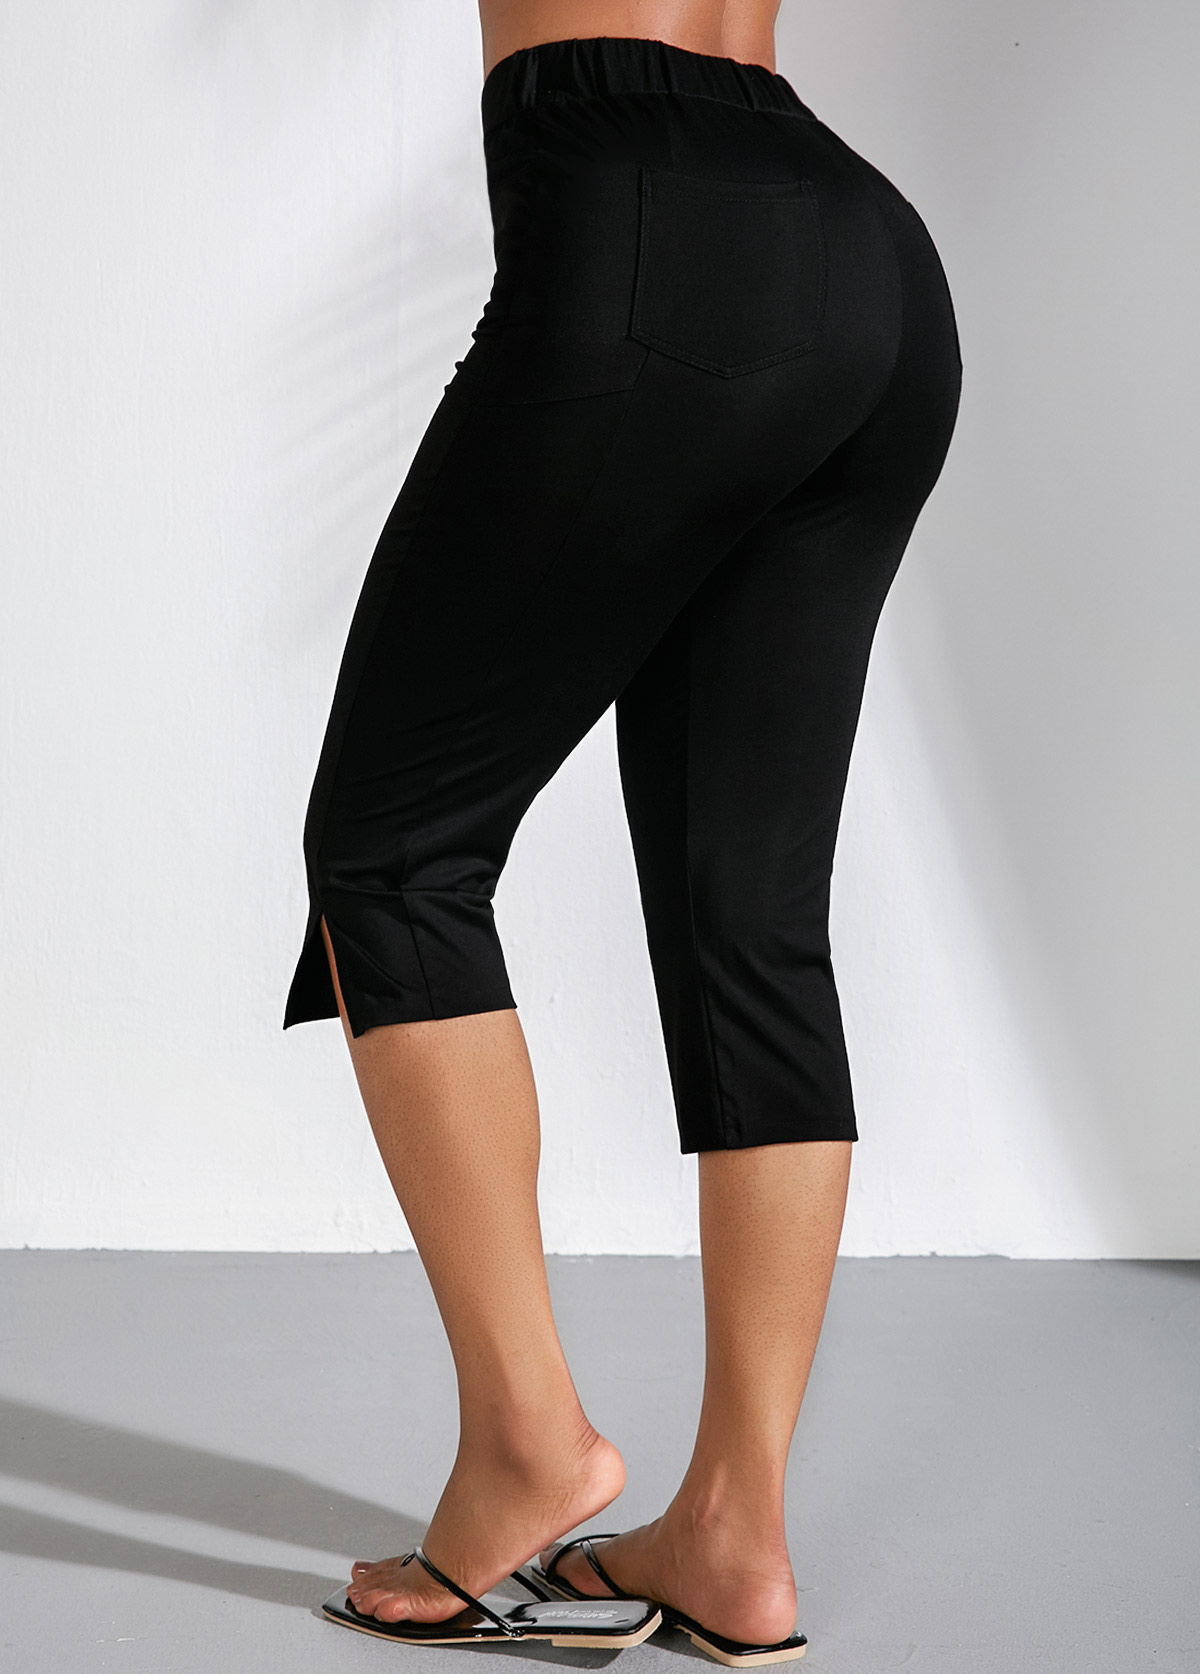 Side Slit High Waist Black Cropped Pants